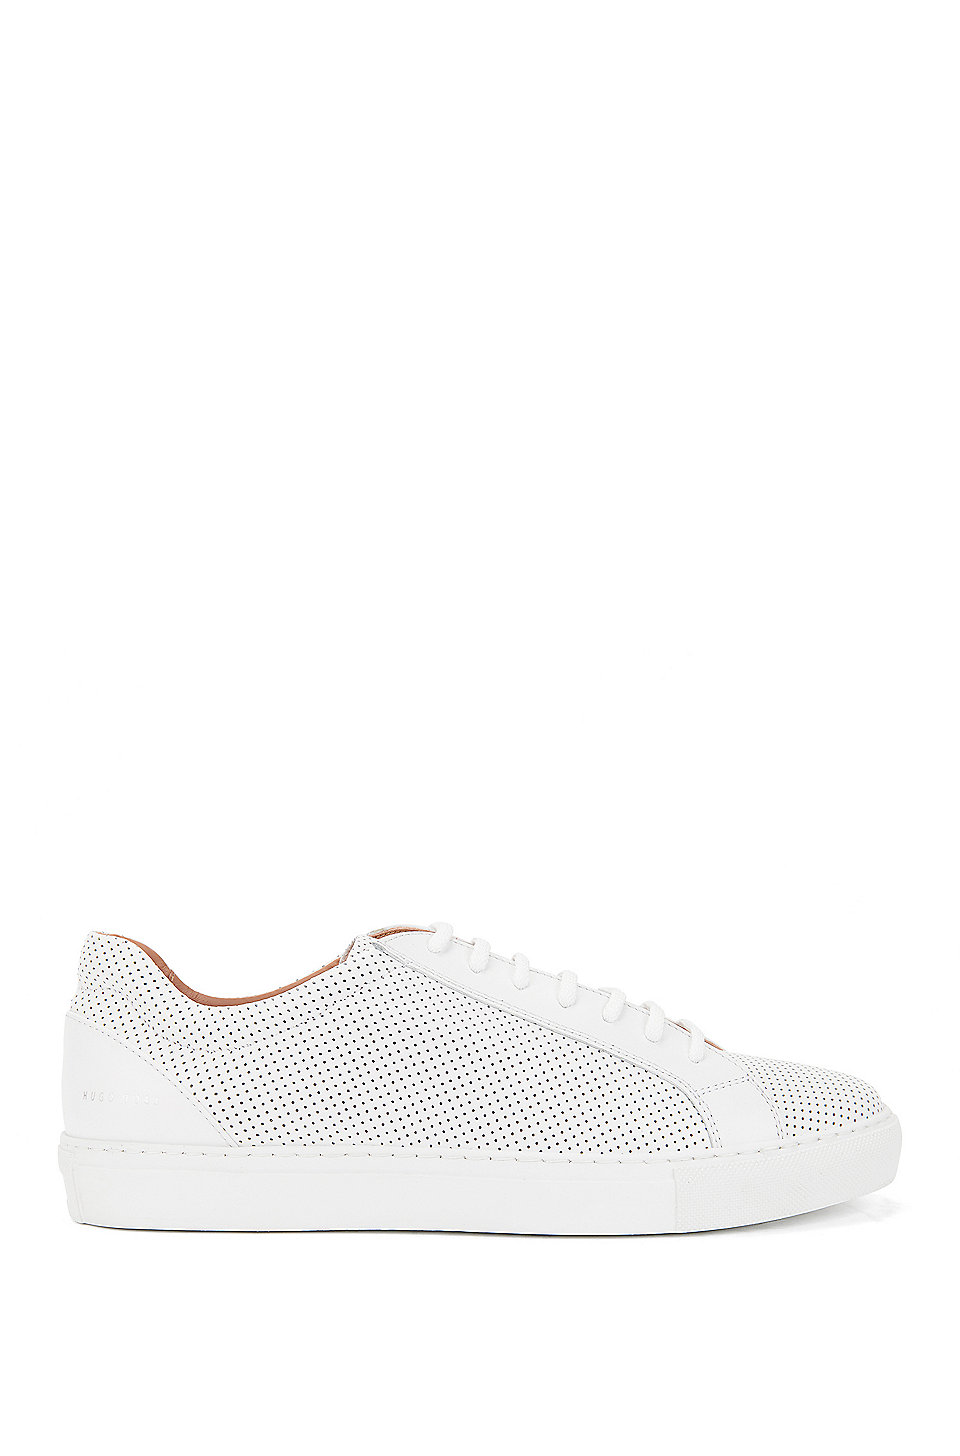 Sneakers aus italienischem Leder mit Perforationen YBSGqVfp0I